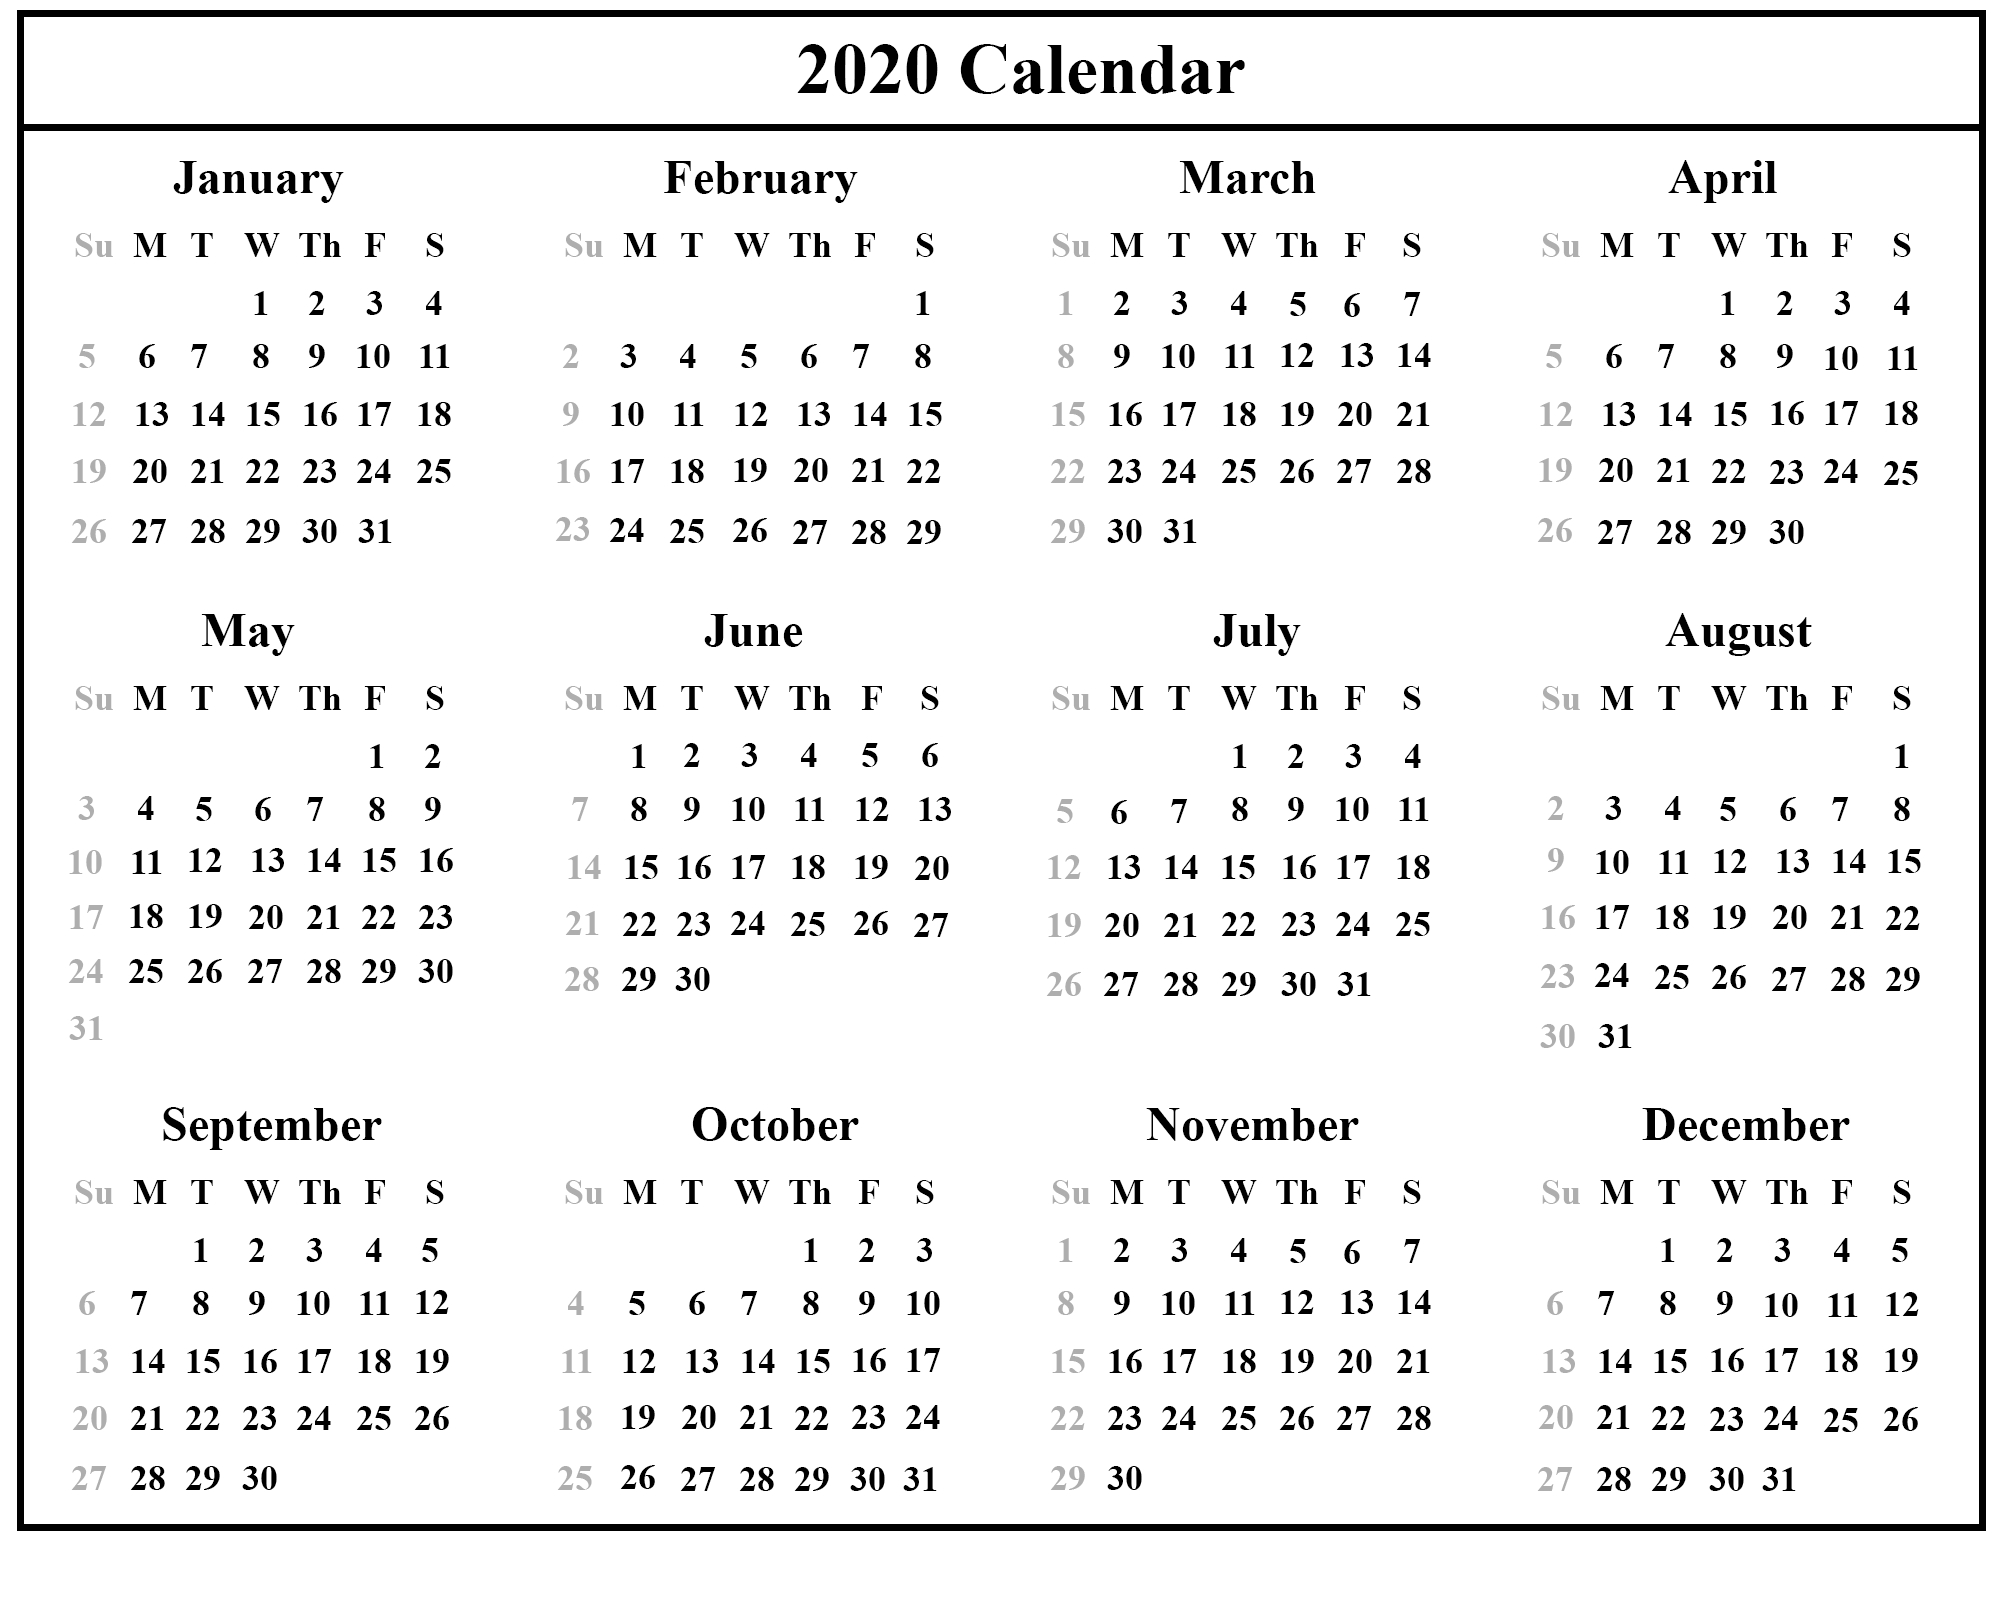 Calendar Pdf 2020 - Colona.rsd7 Printable Monthly Calendar 2020 Australia With School Holidays